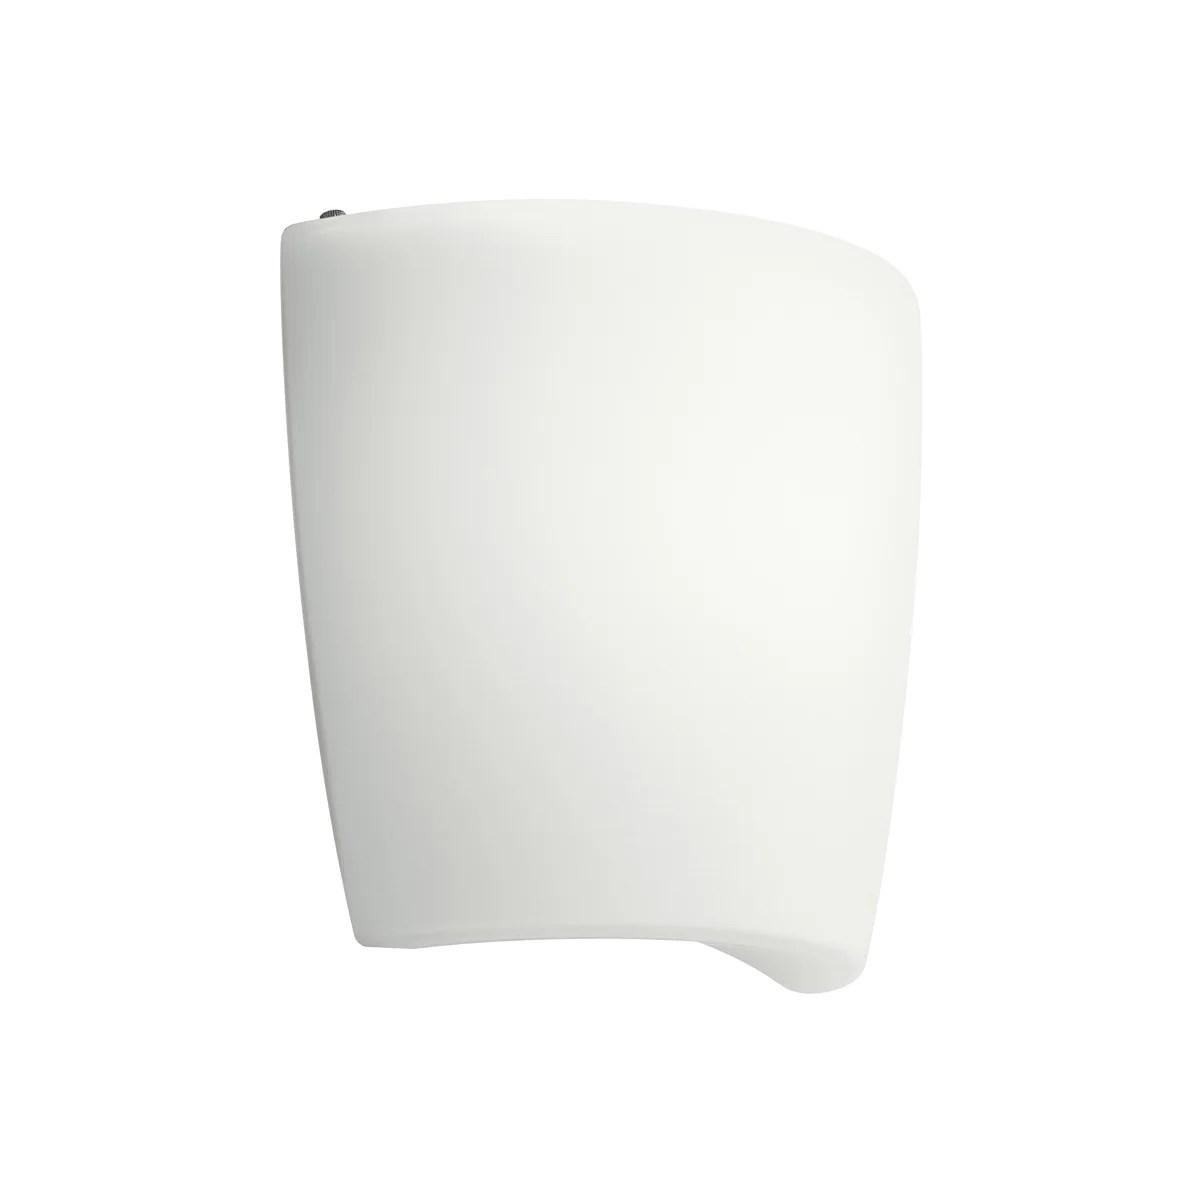 Kichler Fluorescent 1 Light Wall Sconce